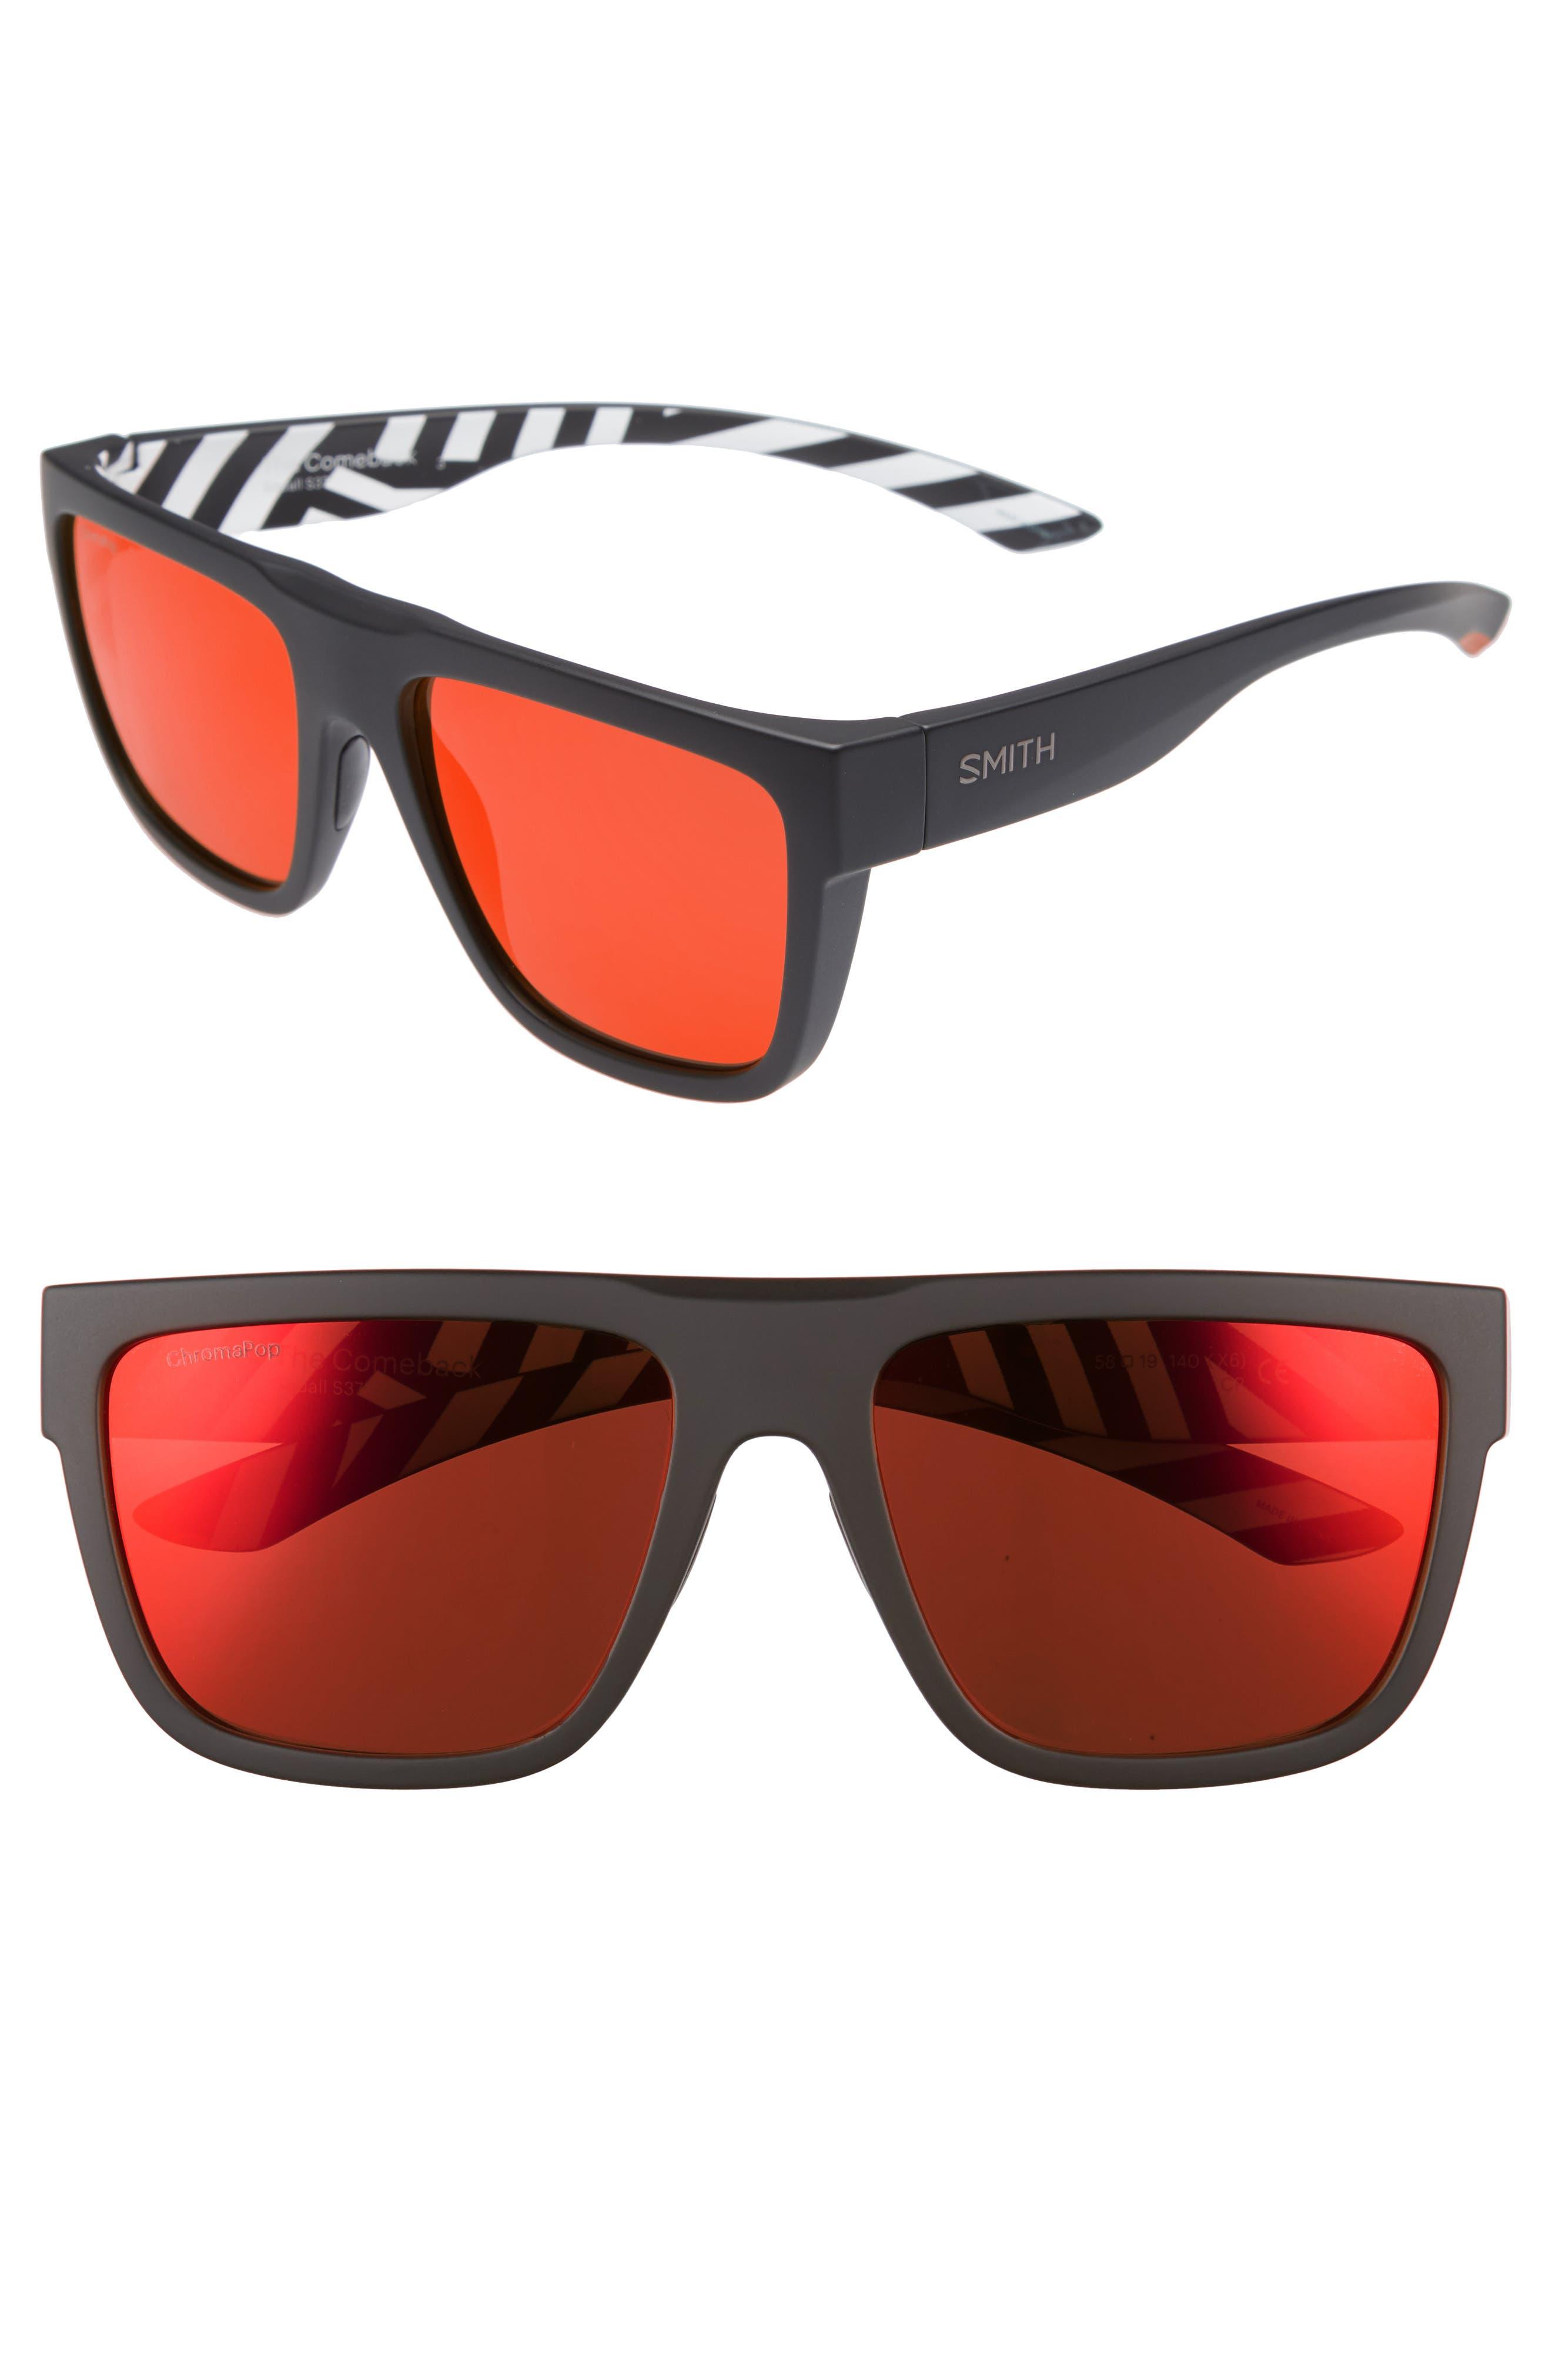 Smith The Comeback 58mm ChromaPop™ Square Sunglasses